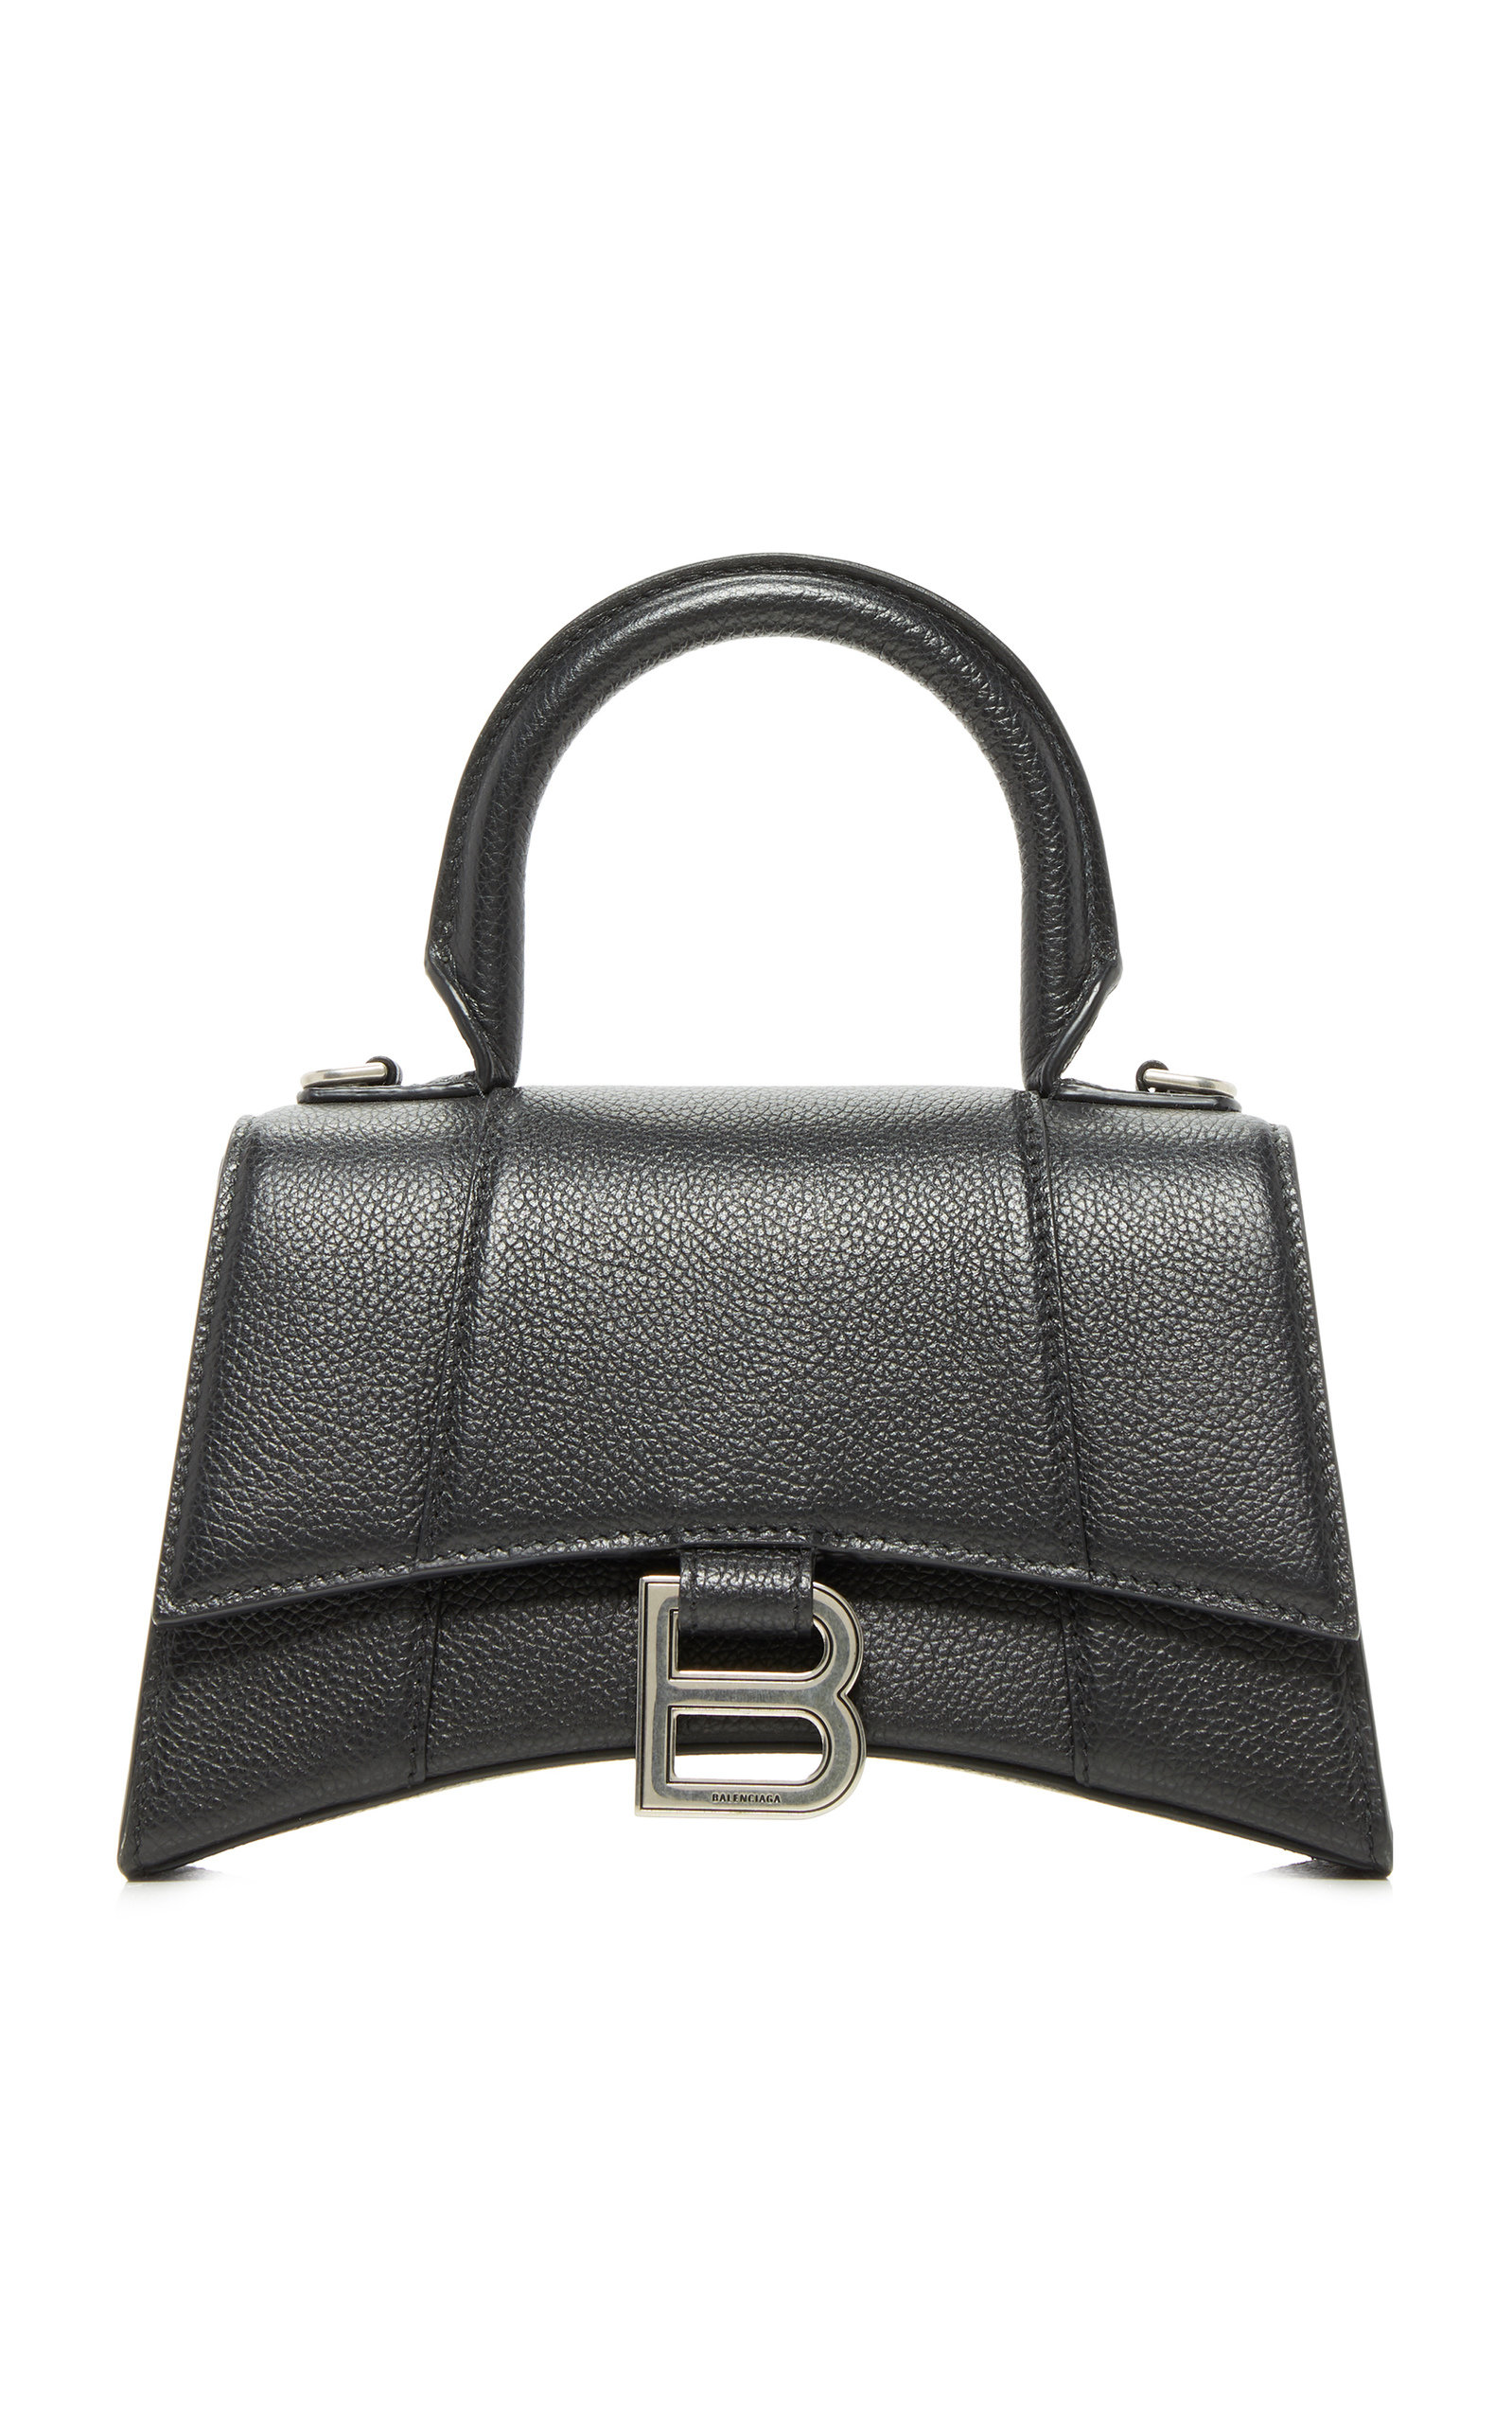 Balenciaga HOURGLASS LEATHER XS BAG